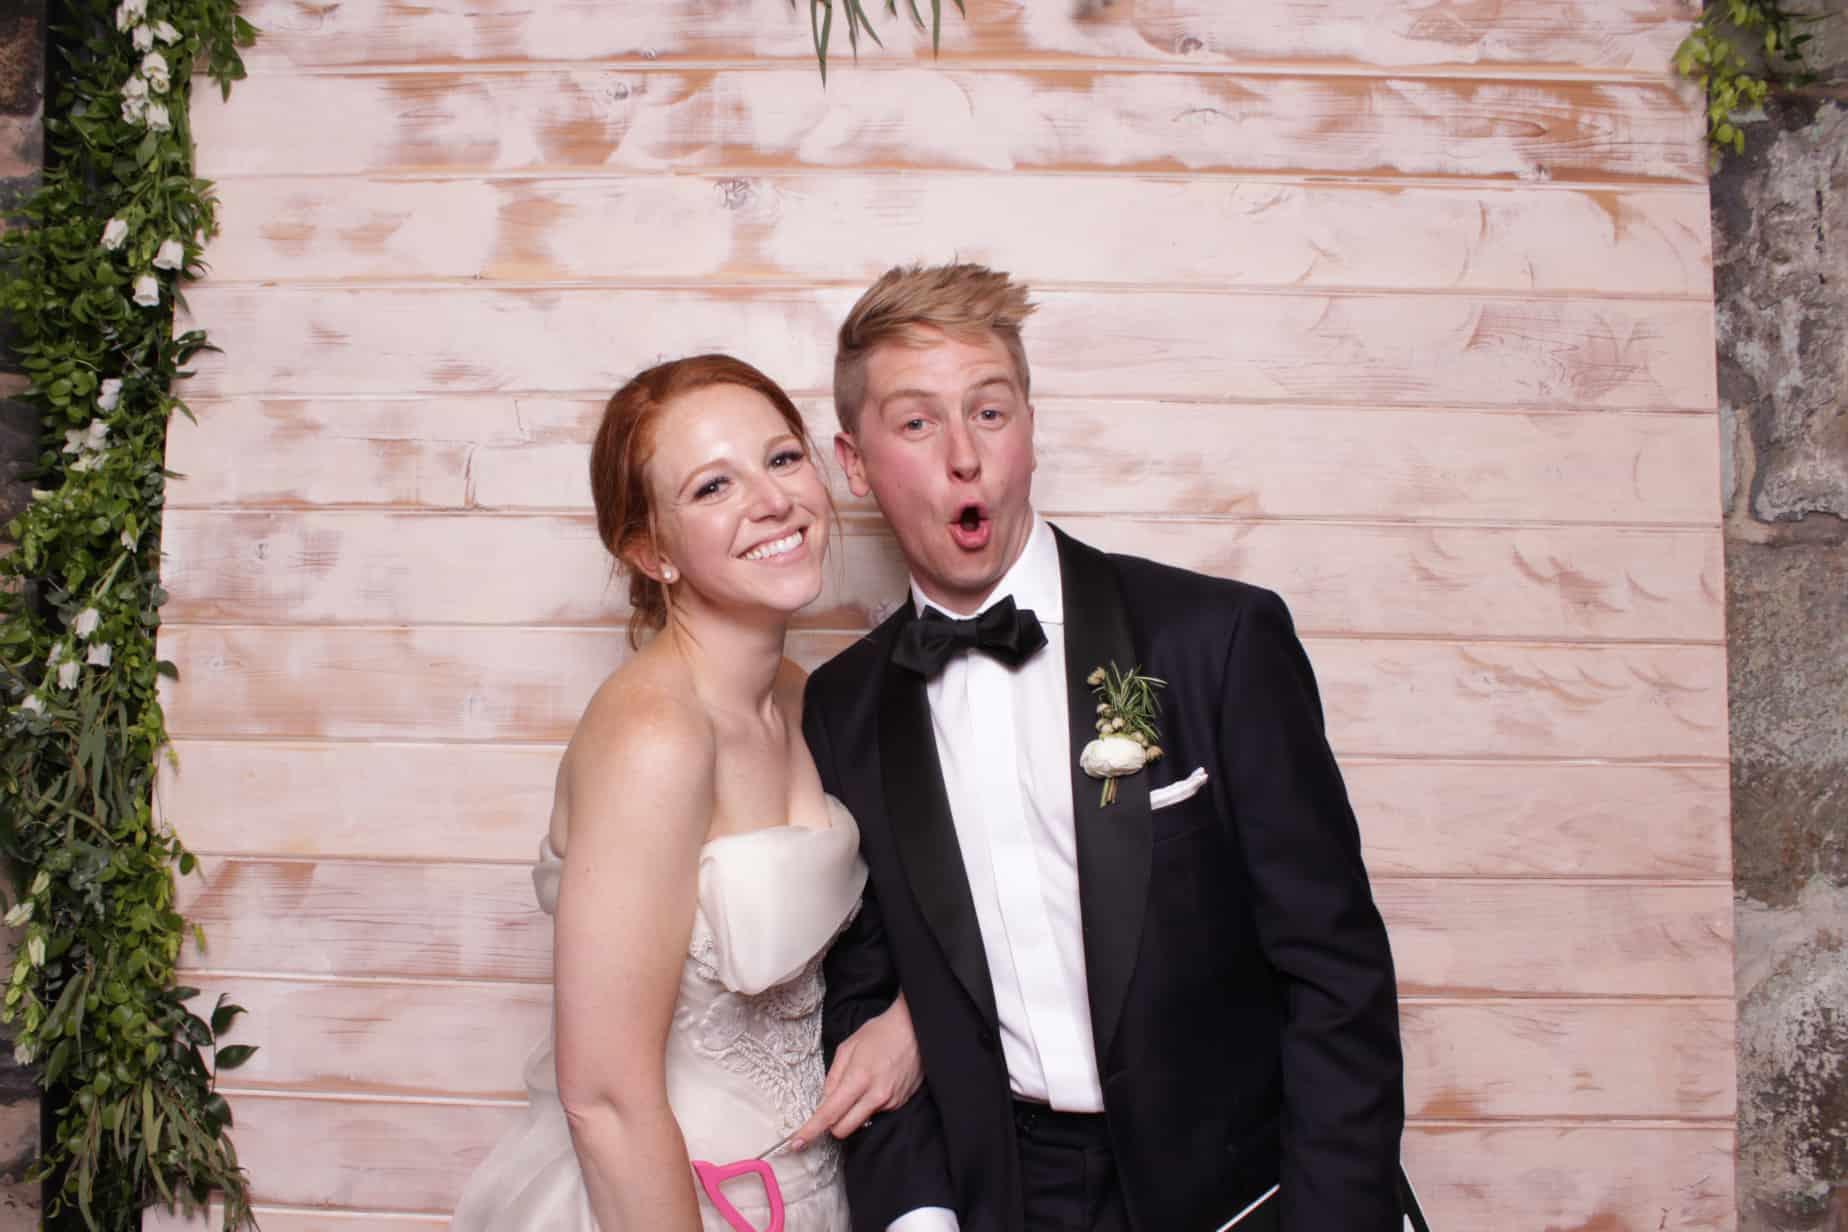 baltimore wedding photo booth